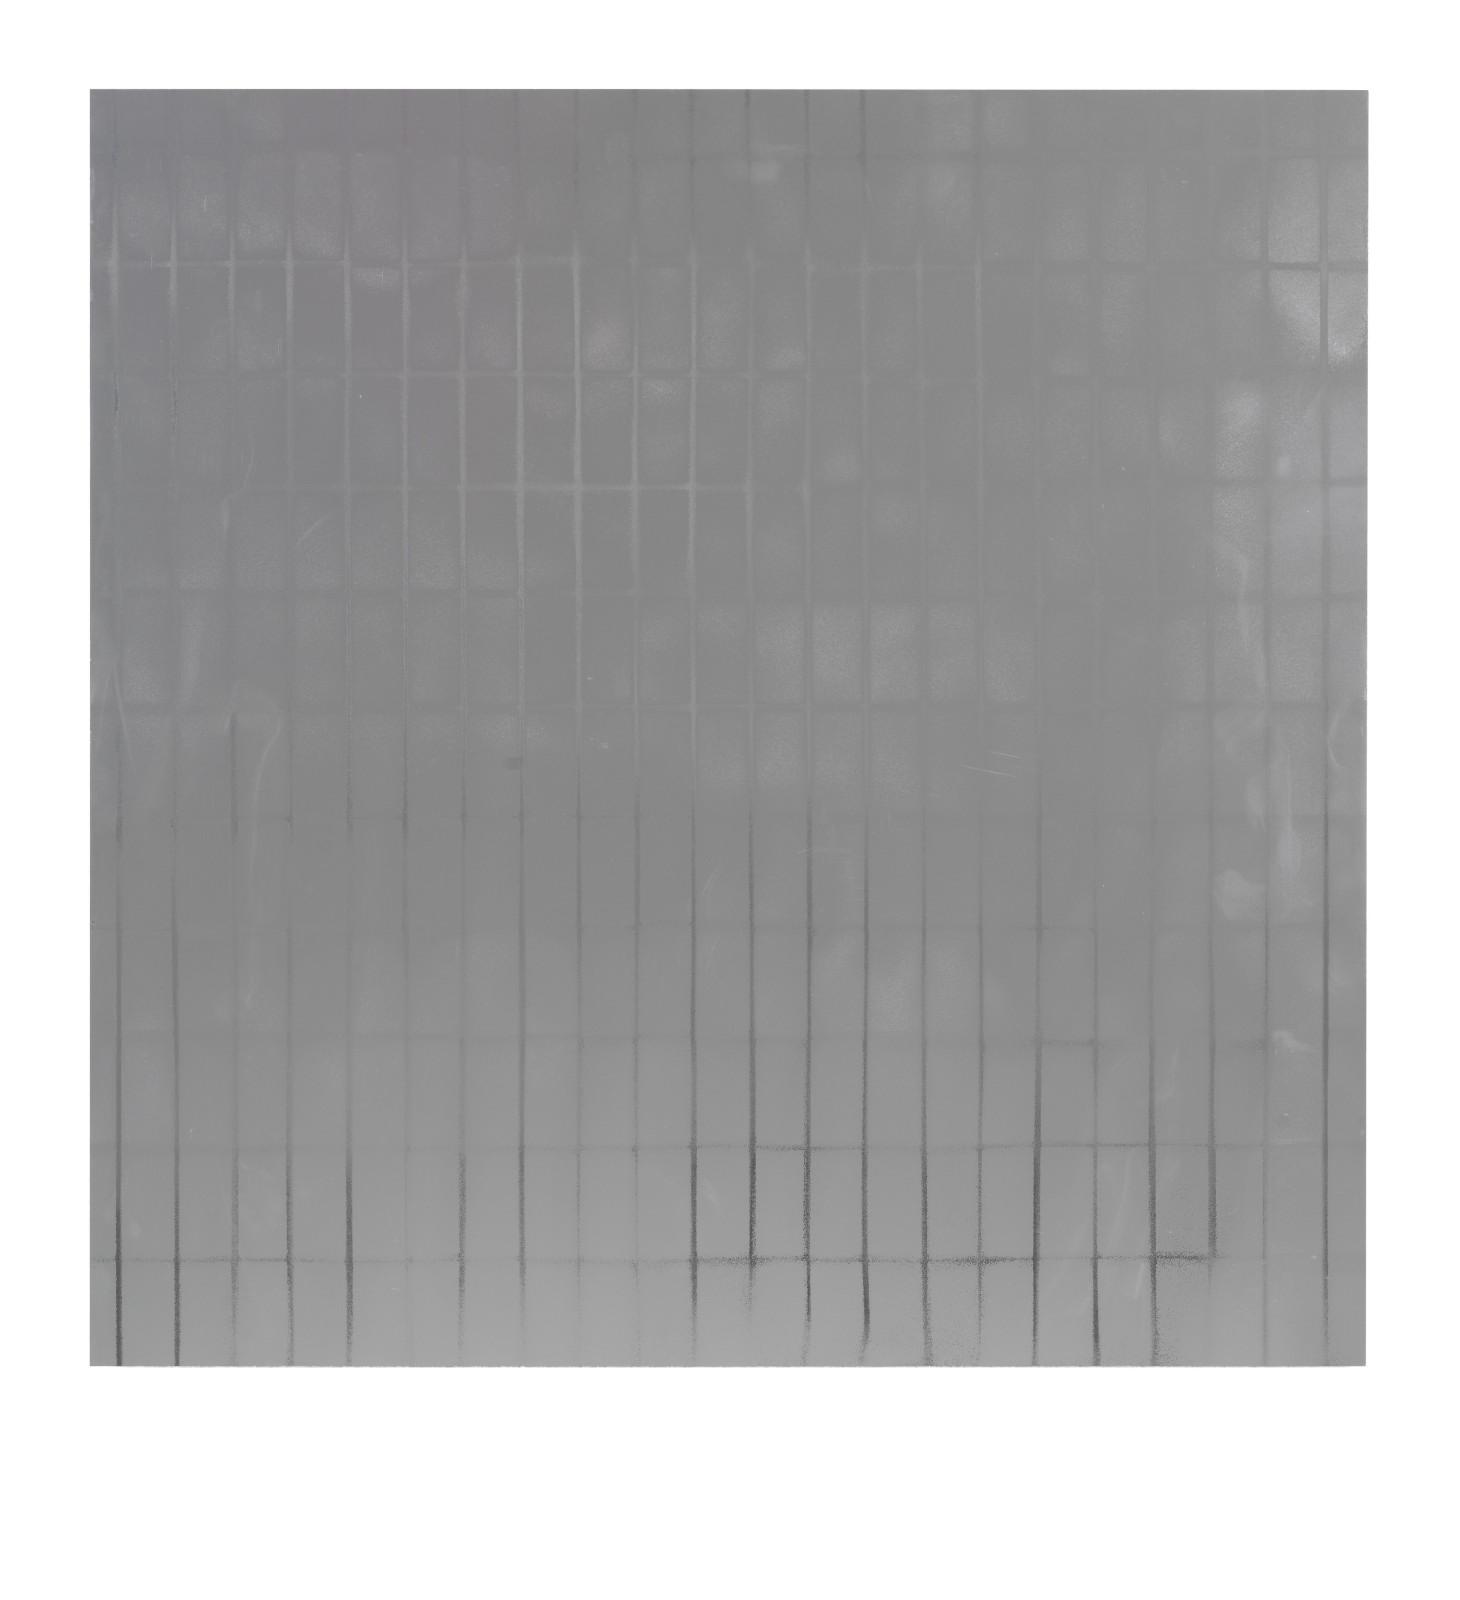 "STAIN : 55°36'32.2""N 13°00'44.9""E, 2016, spraypaint on aluminium, 81,3 x 81,3 cm"